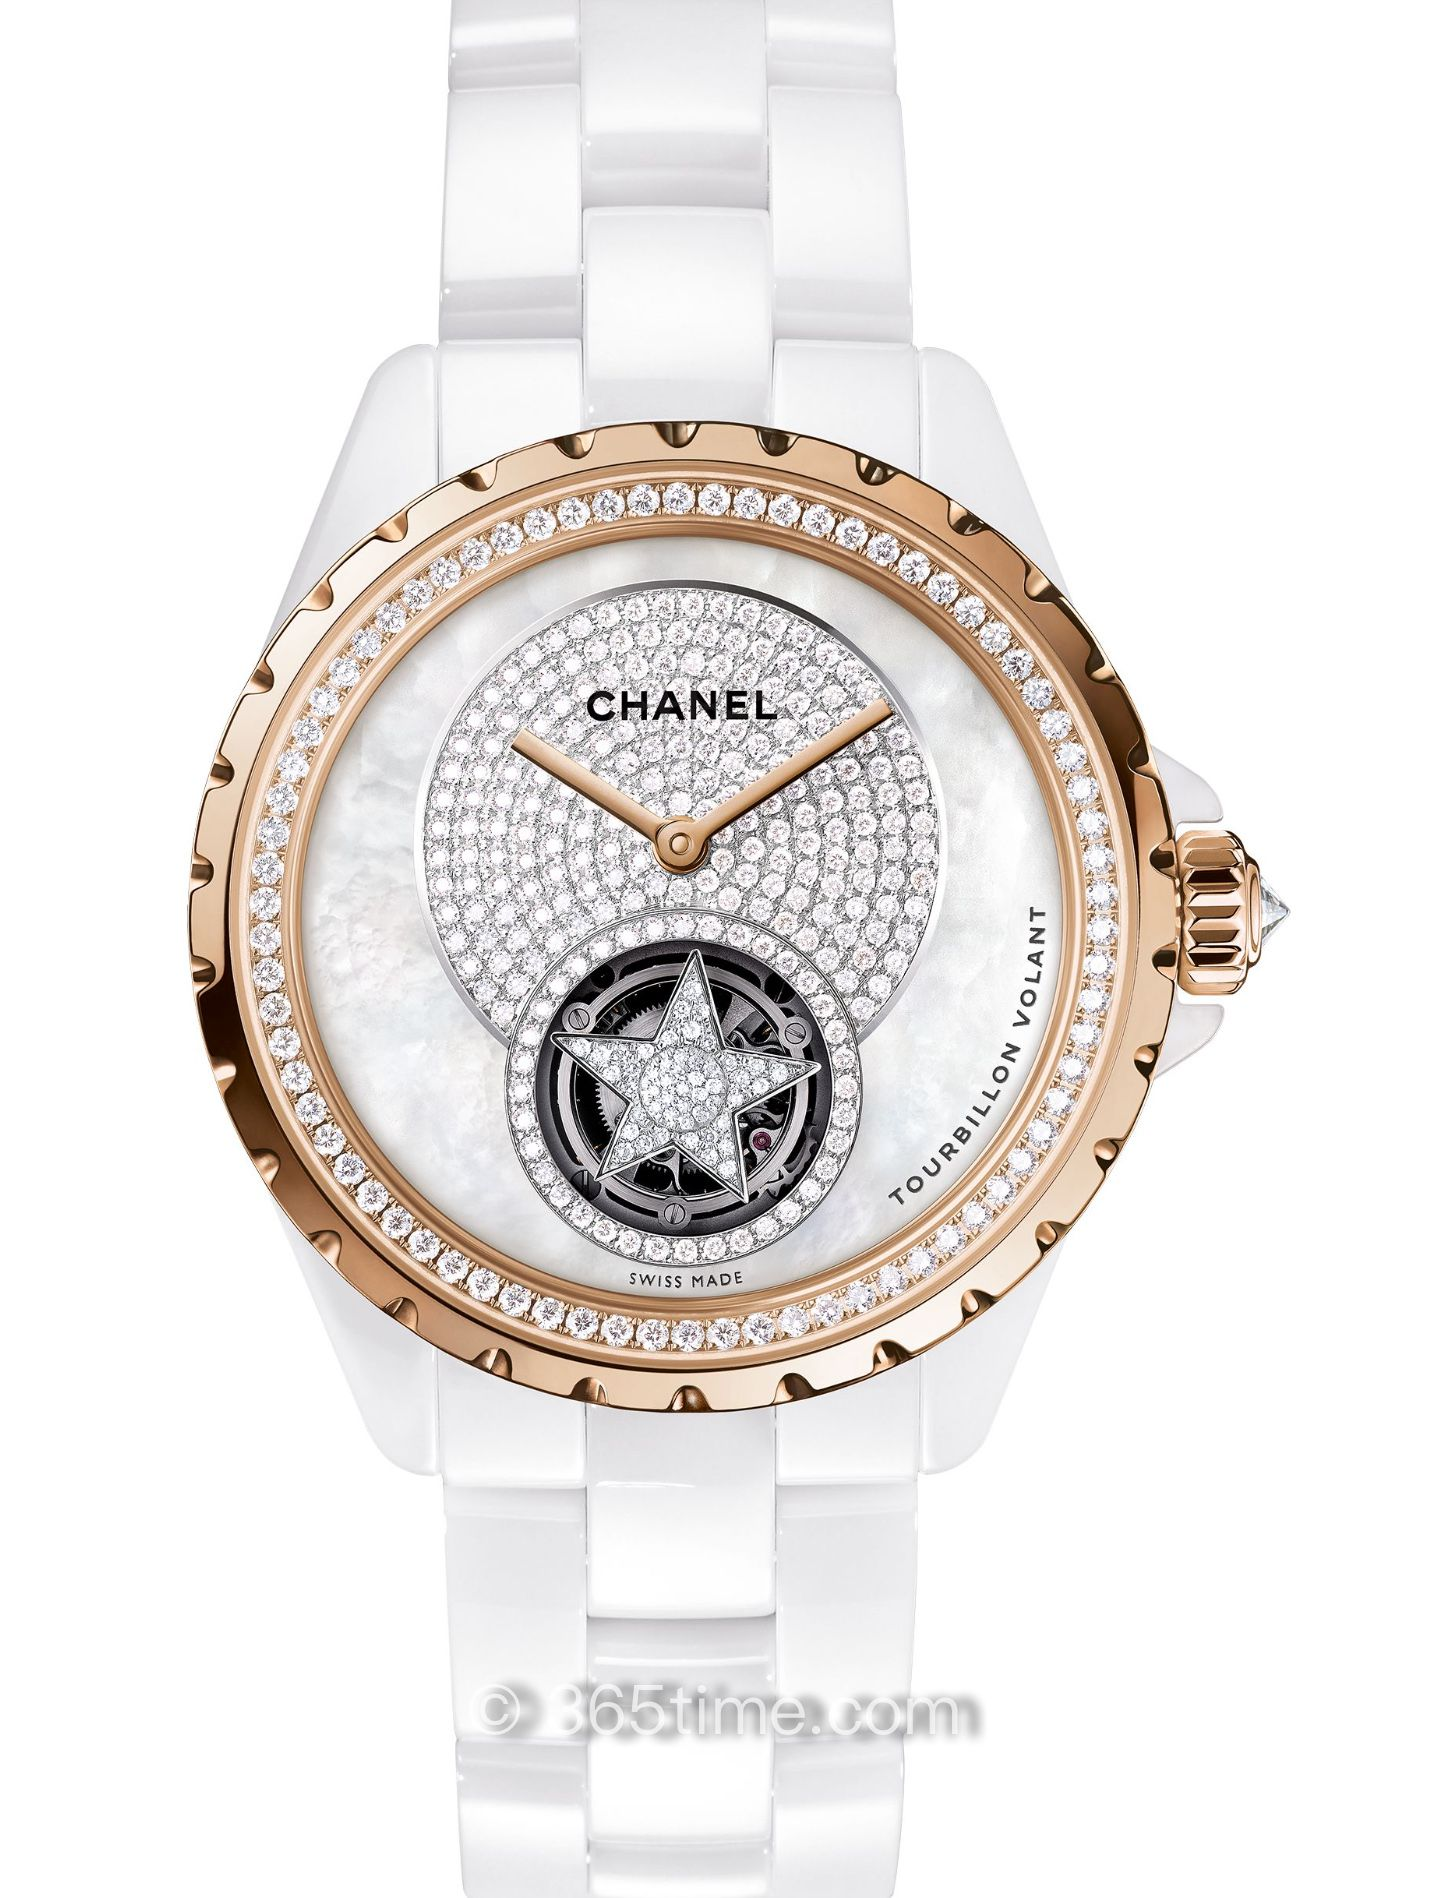 Chanel香奈儿J12 浮动式陀飞轮腕表H4563